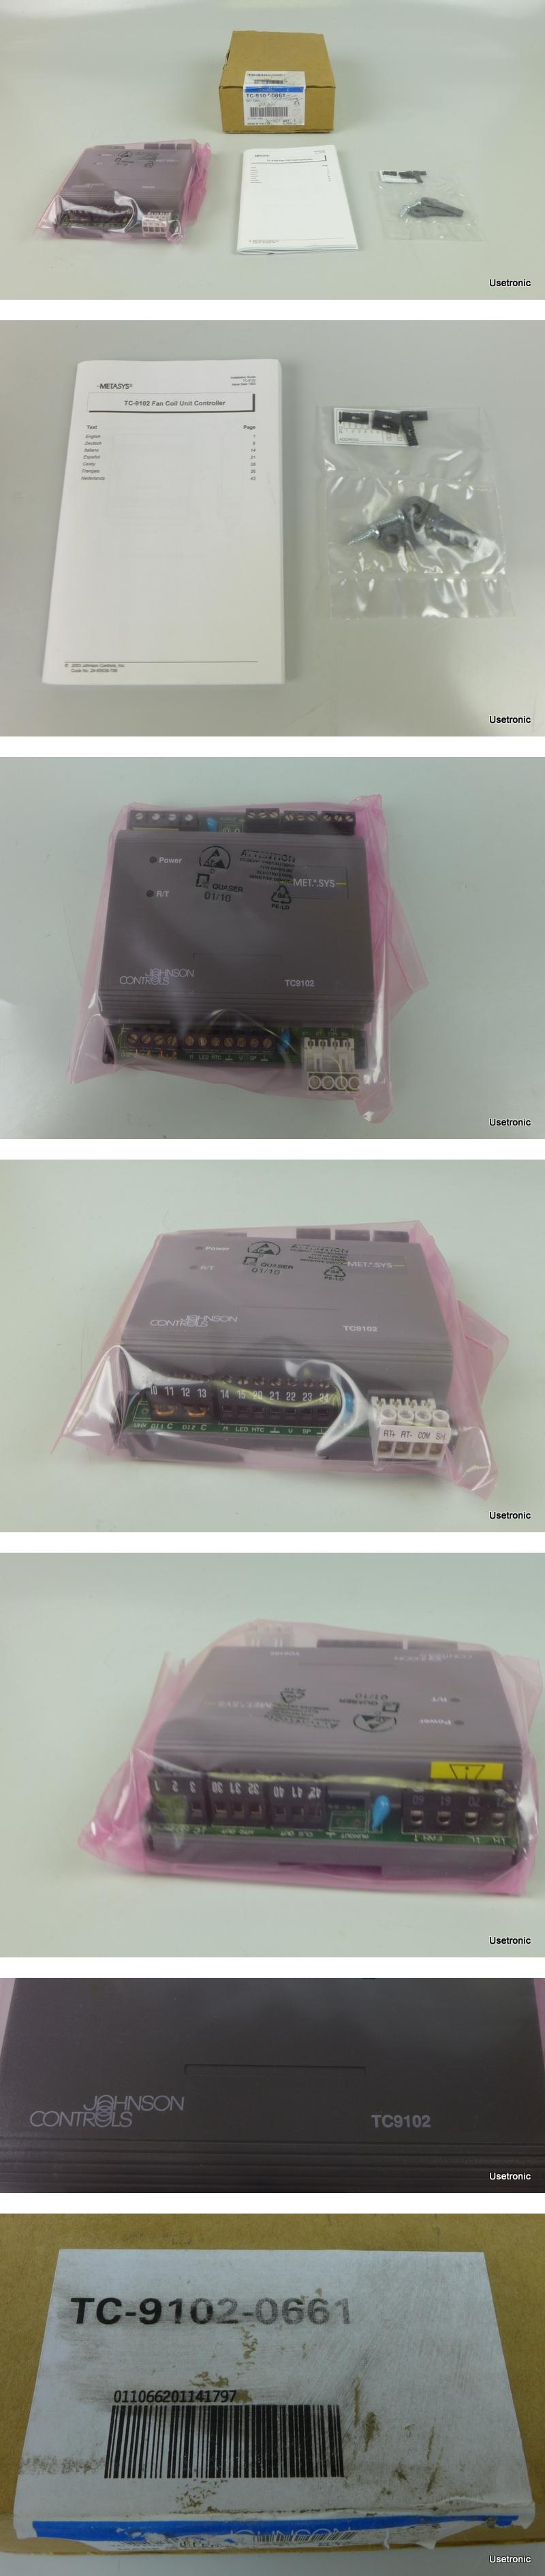 Johnson Controls Metasys TC9102